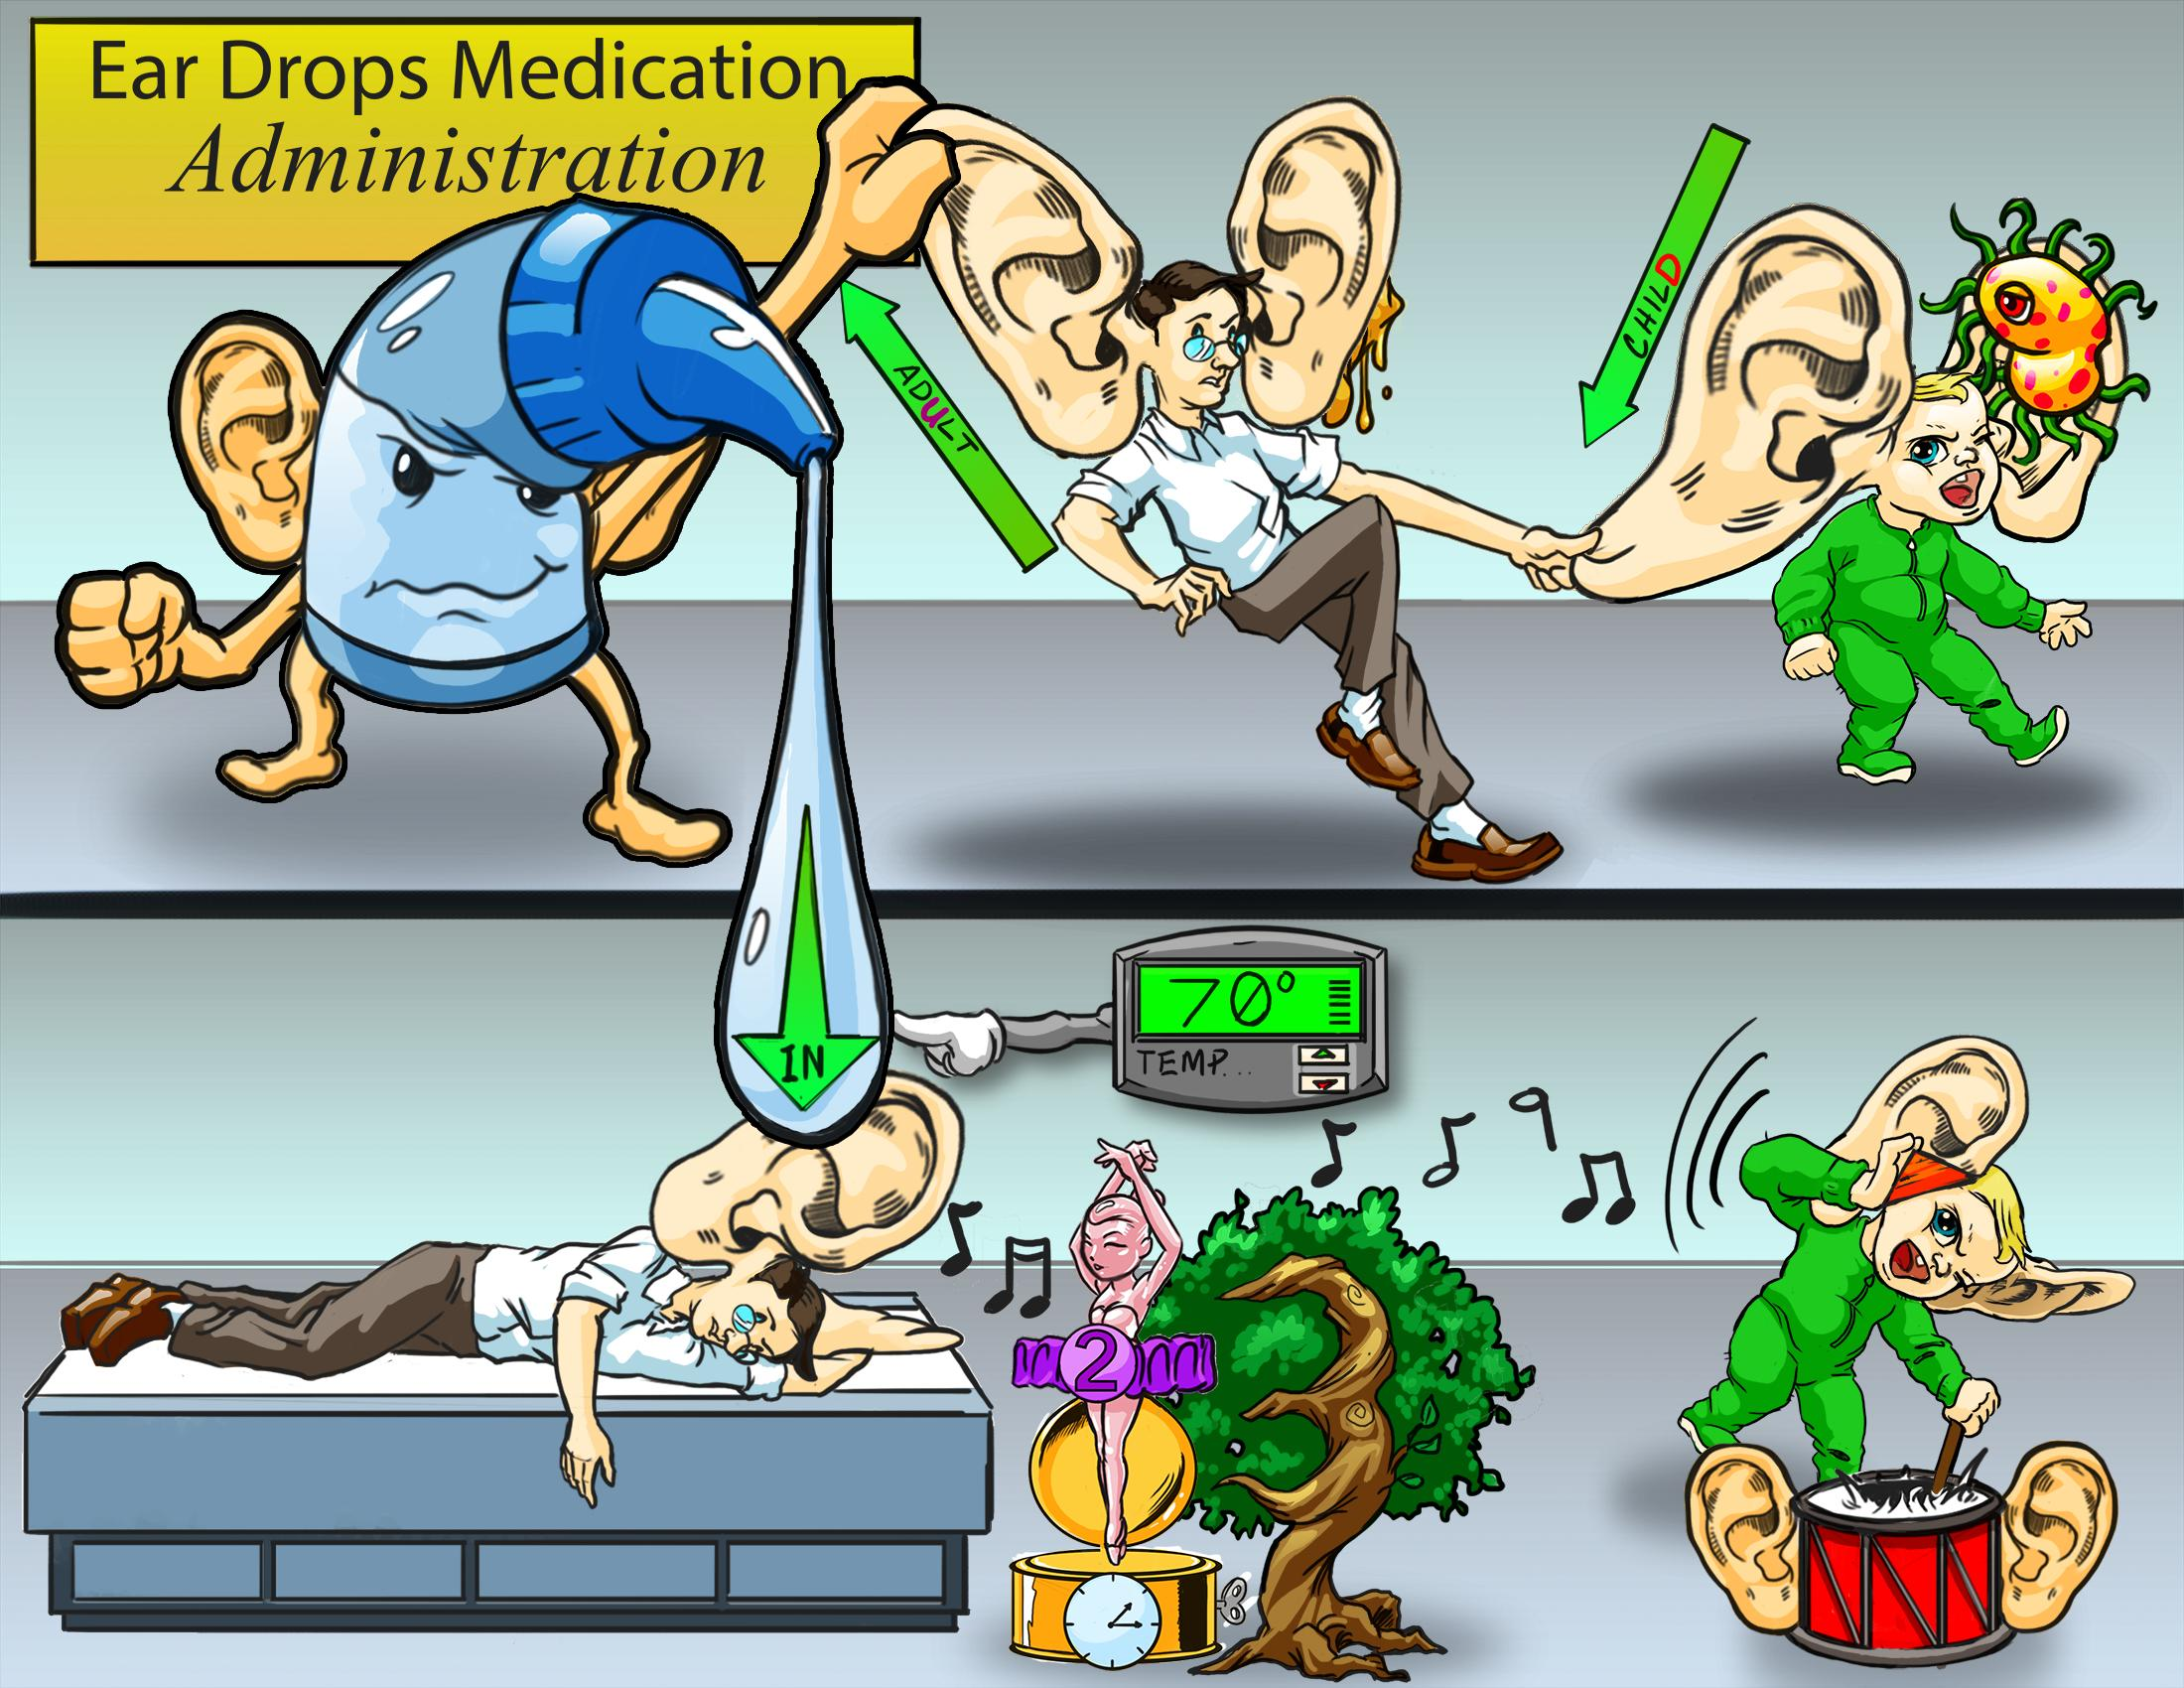 Ear Drops Medication Administration